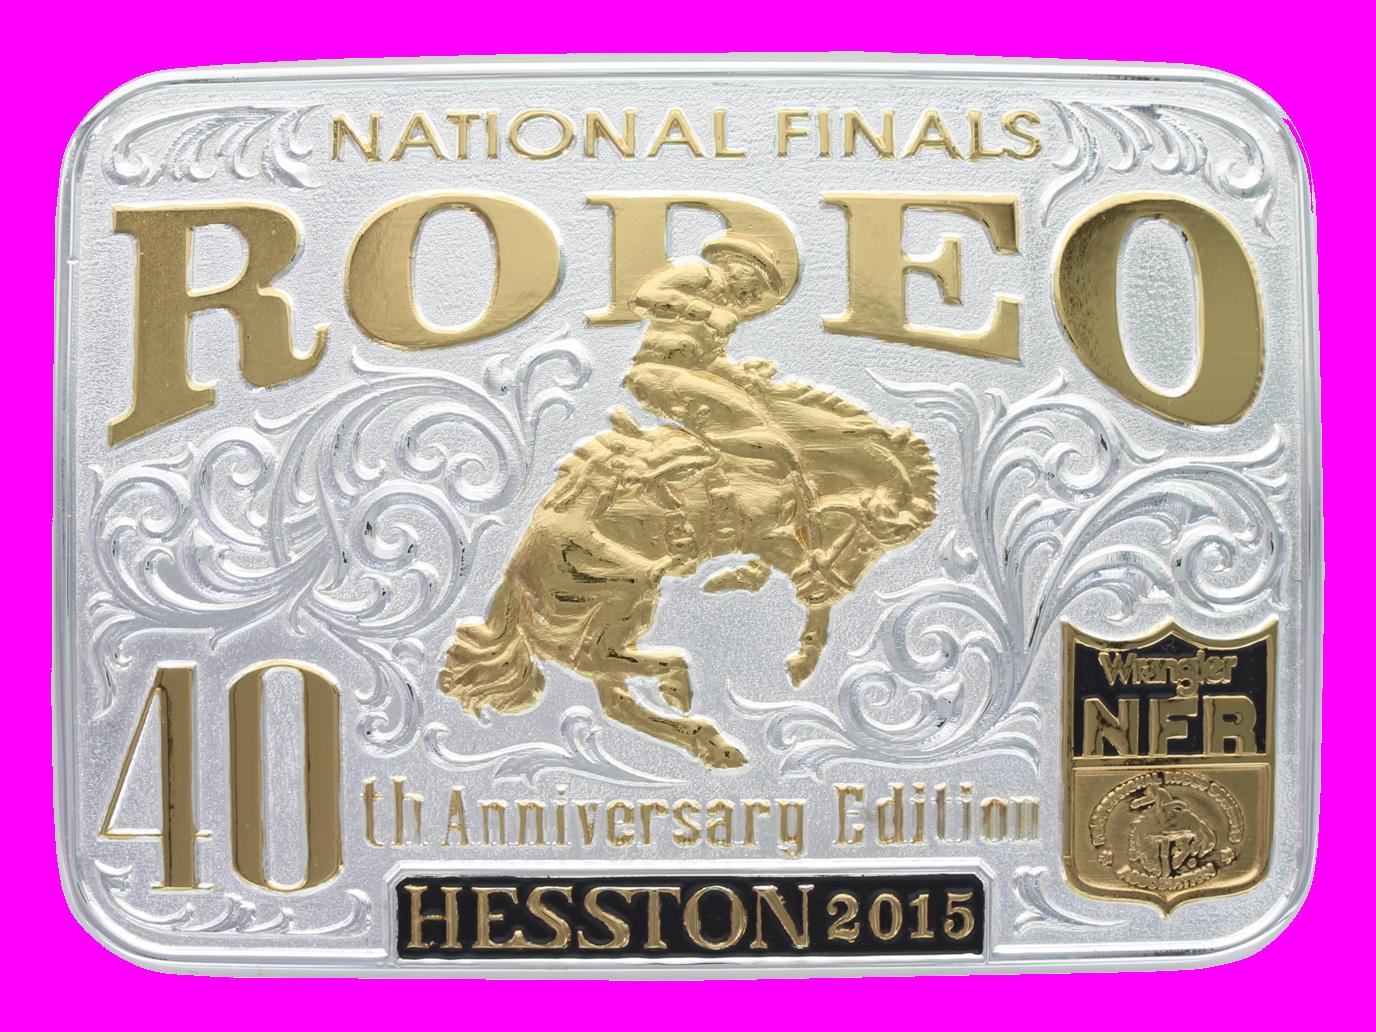 Hesston PNG Gold